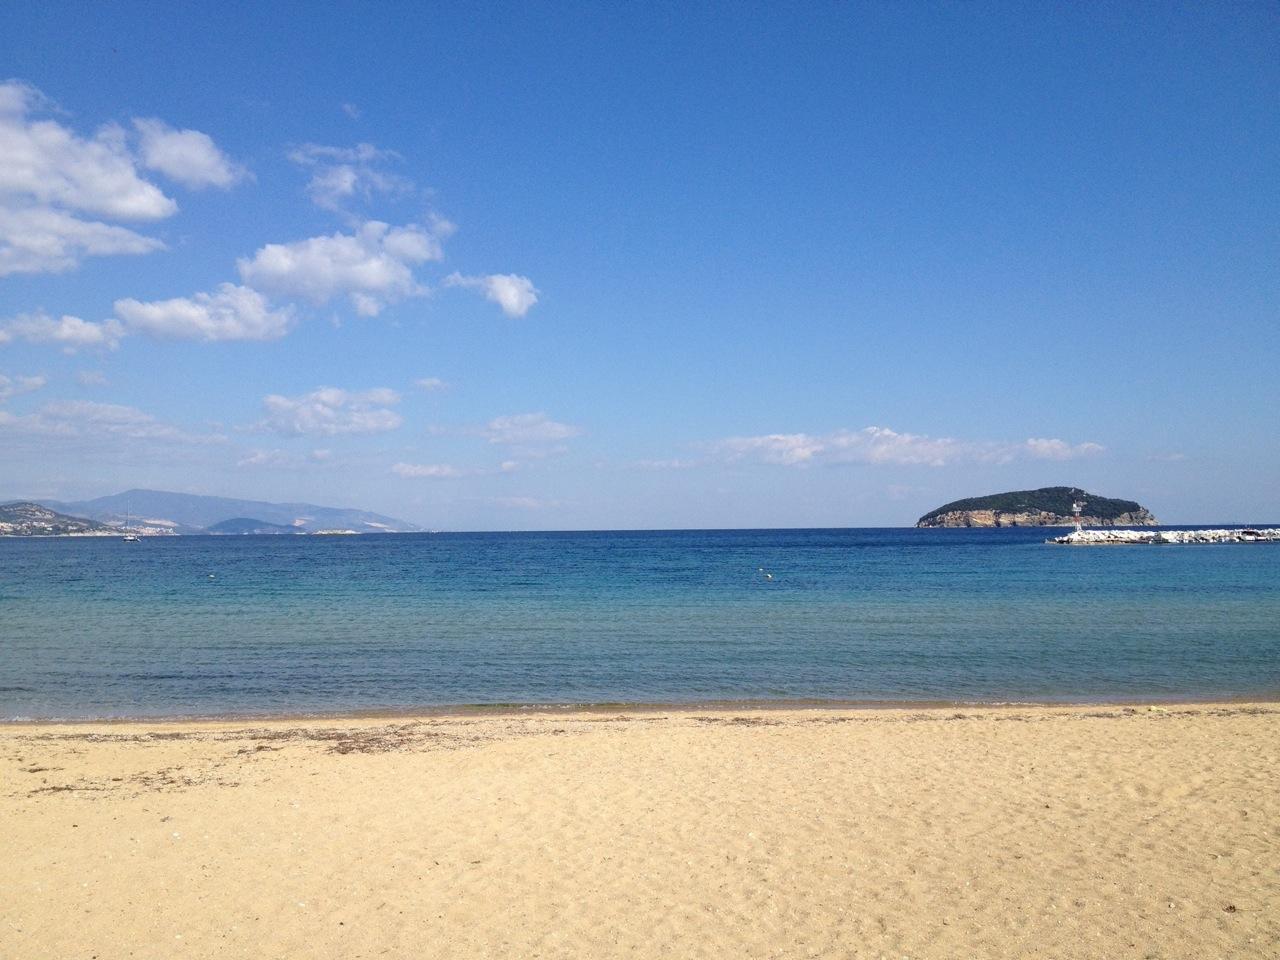 Aegean seacoast, Kavala Gulf